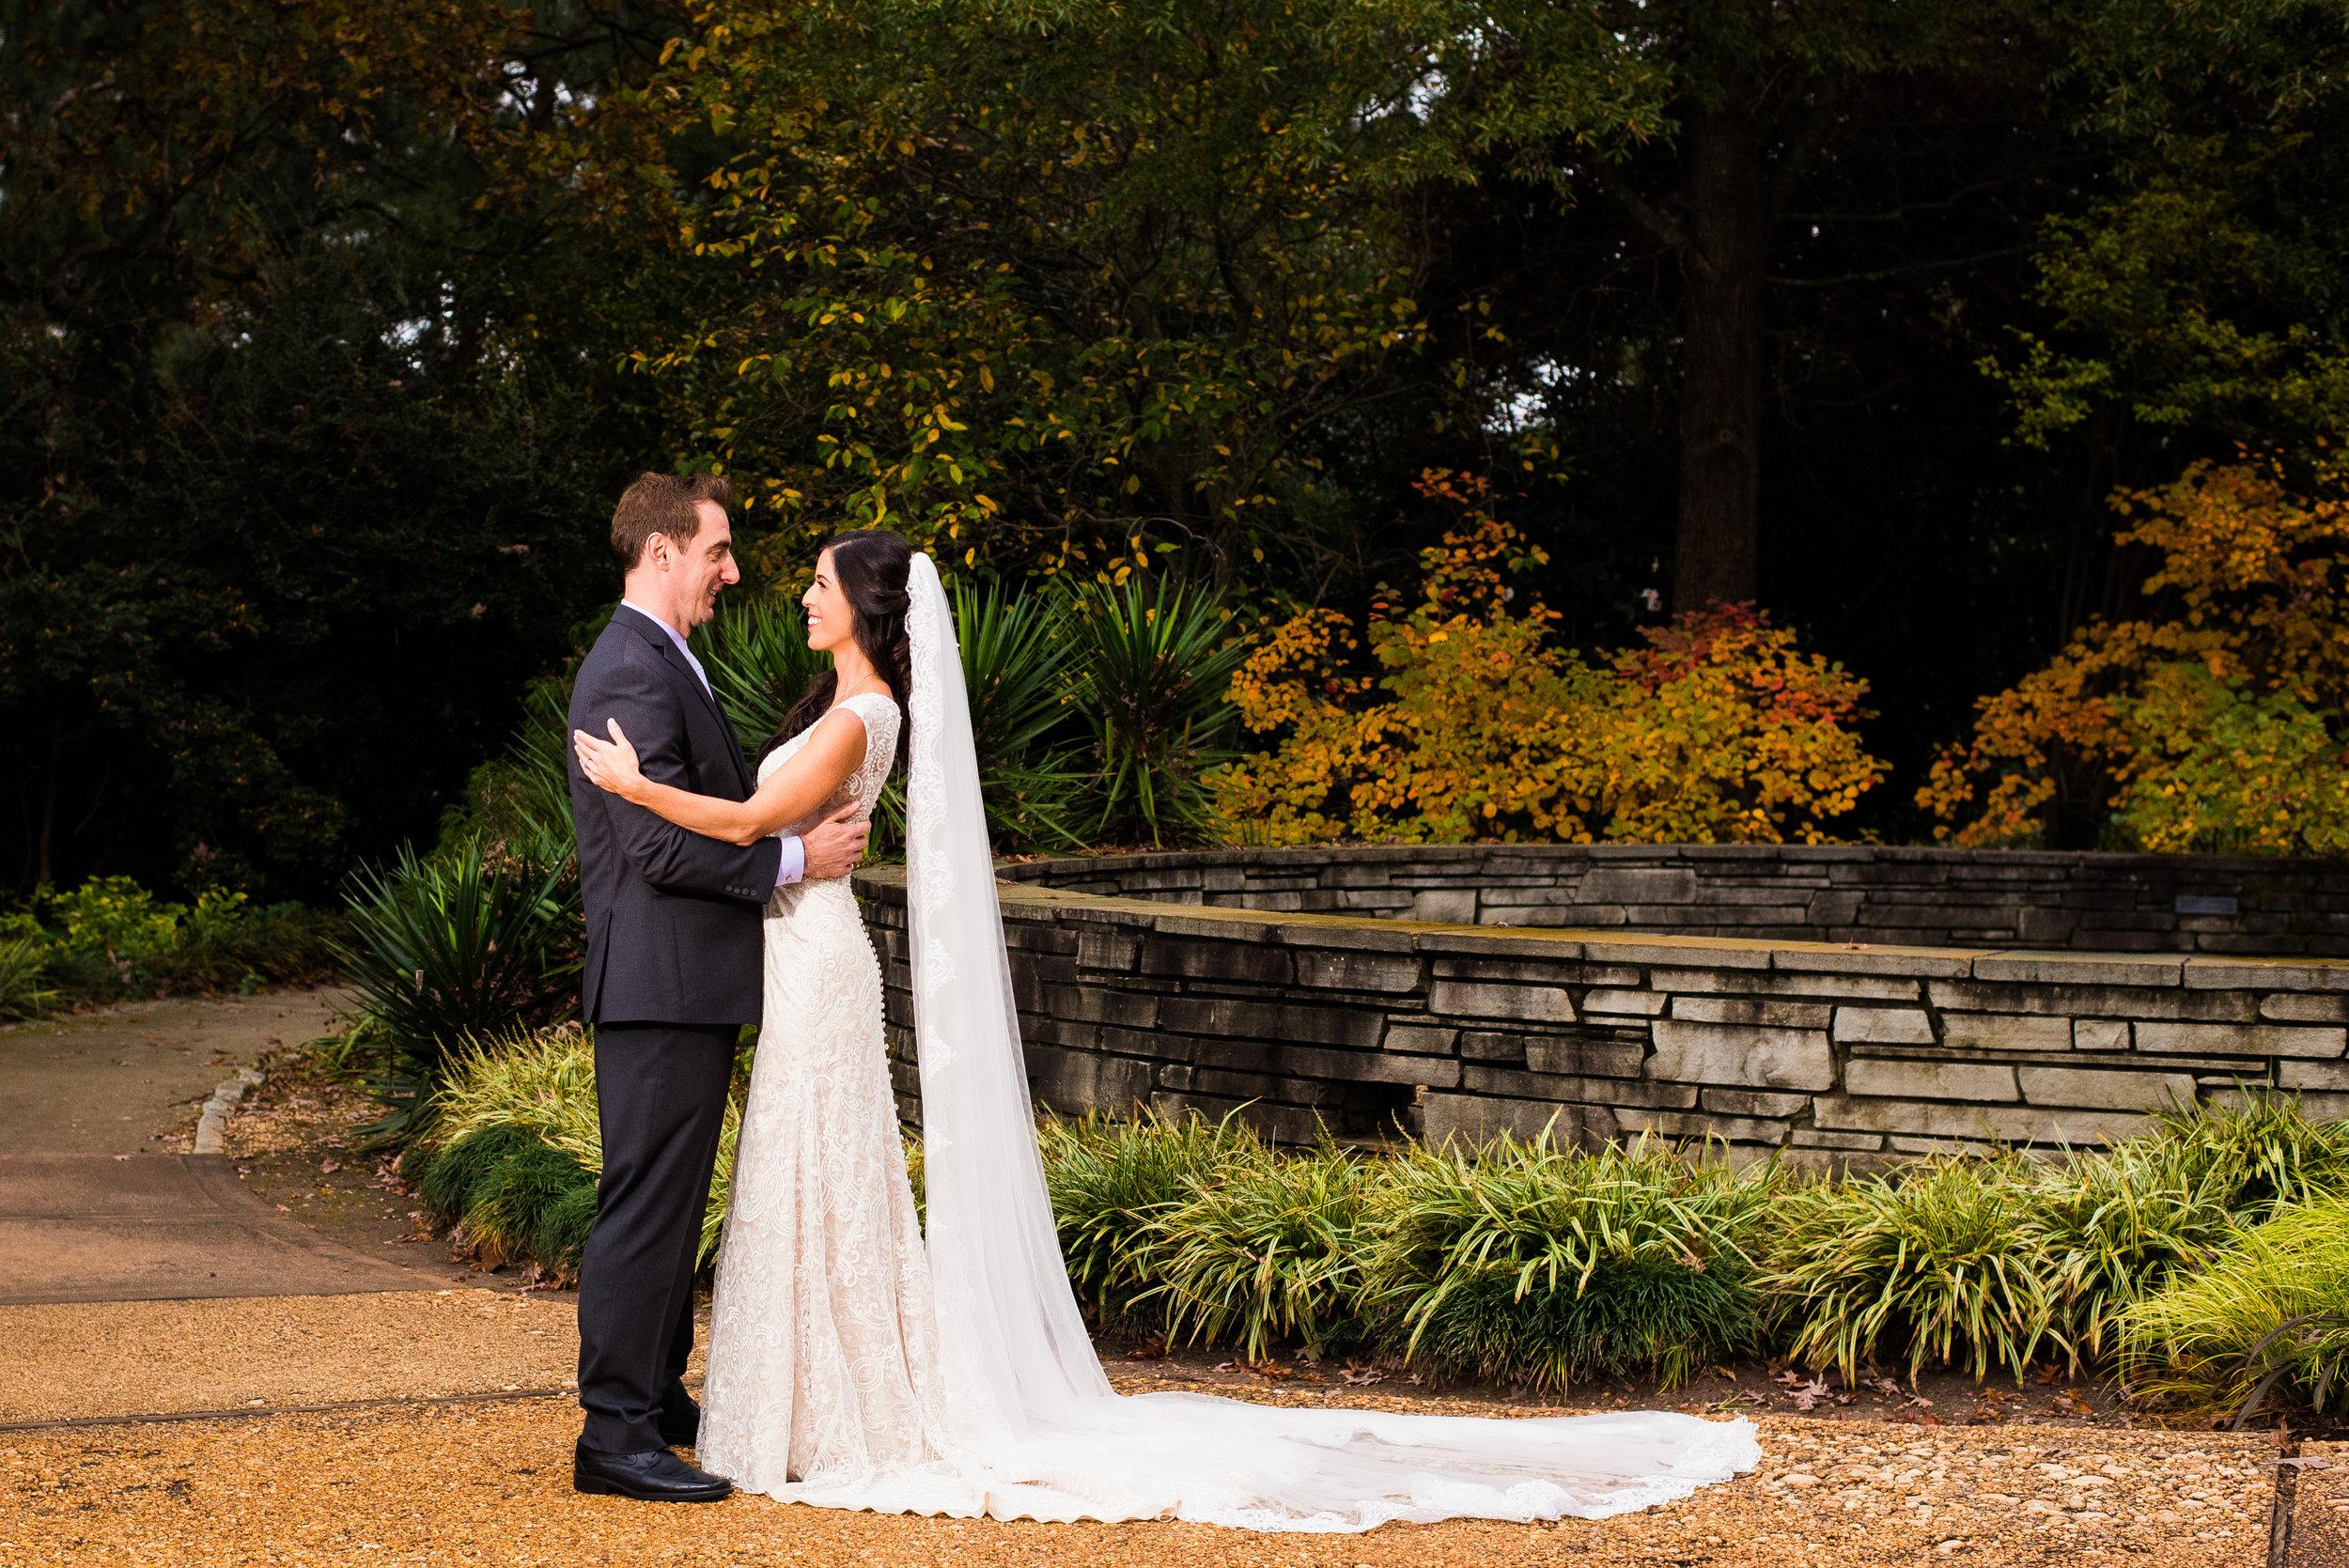 Heather & Lincoln Groves Wedding SP WEB_13.jpg